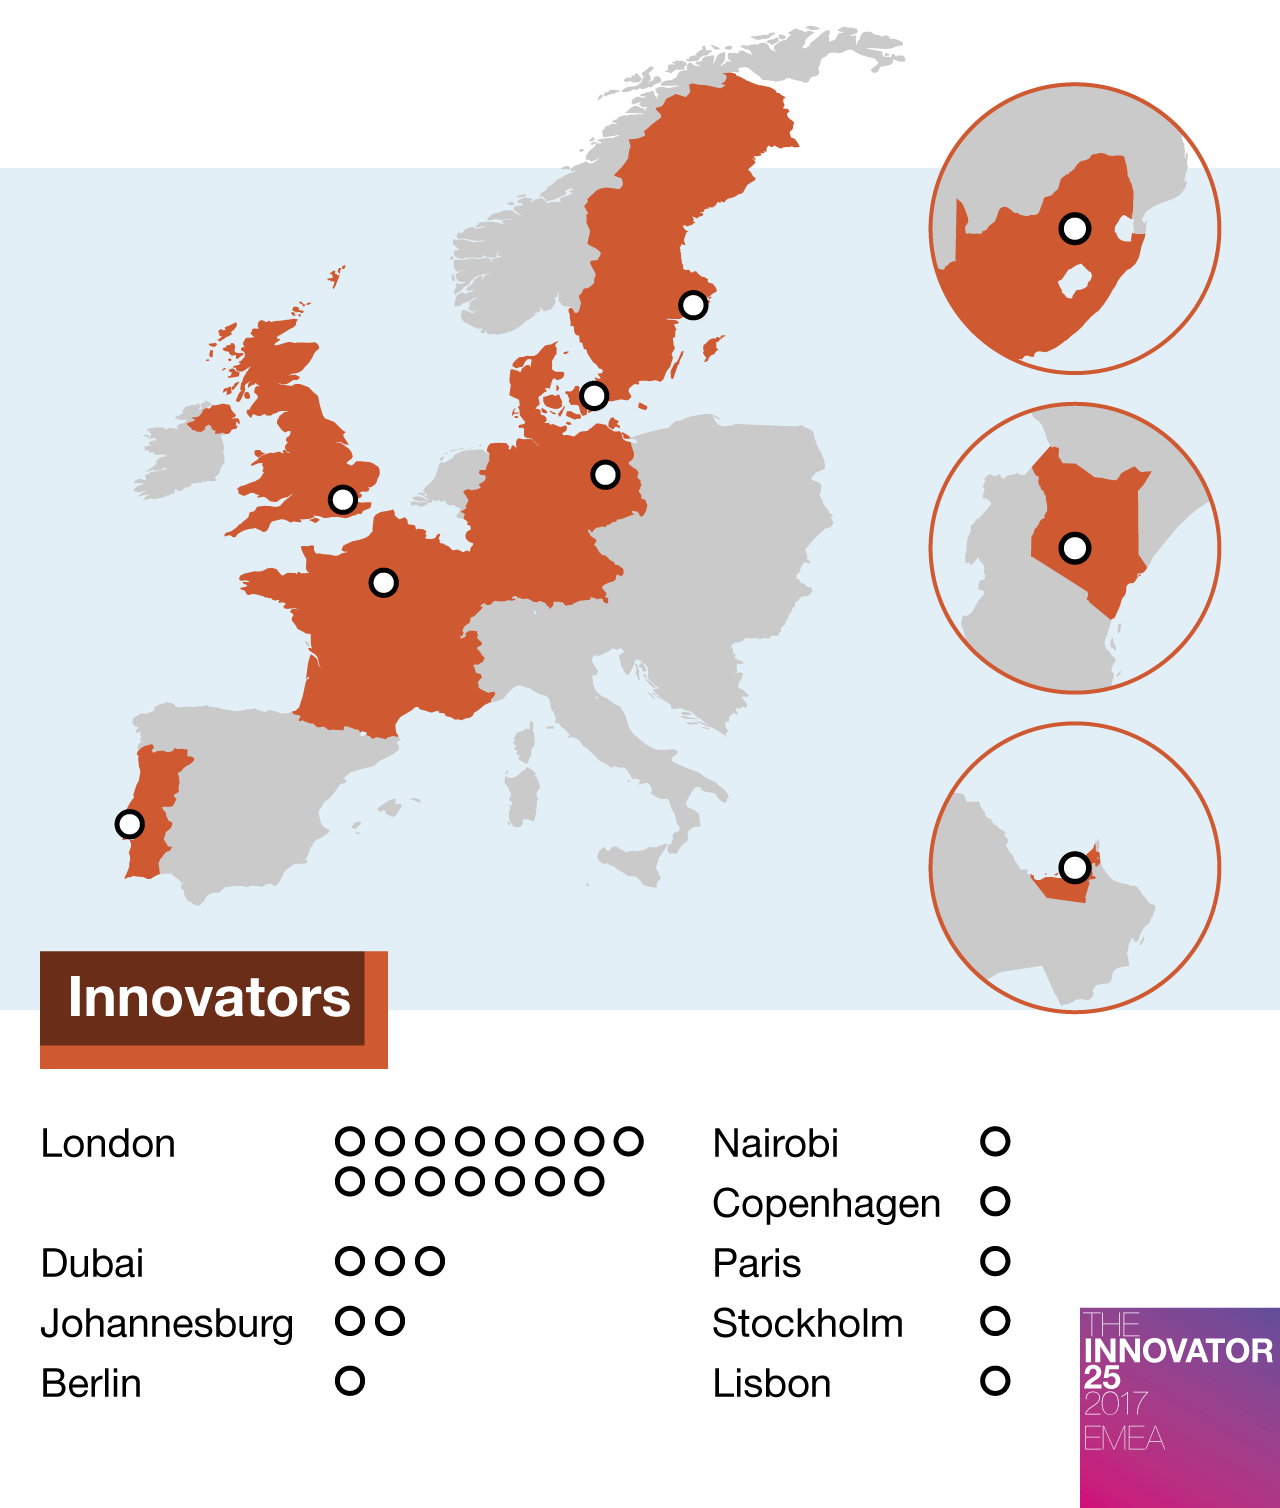 Innovator 25 EMEA - Location